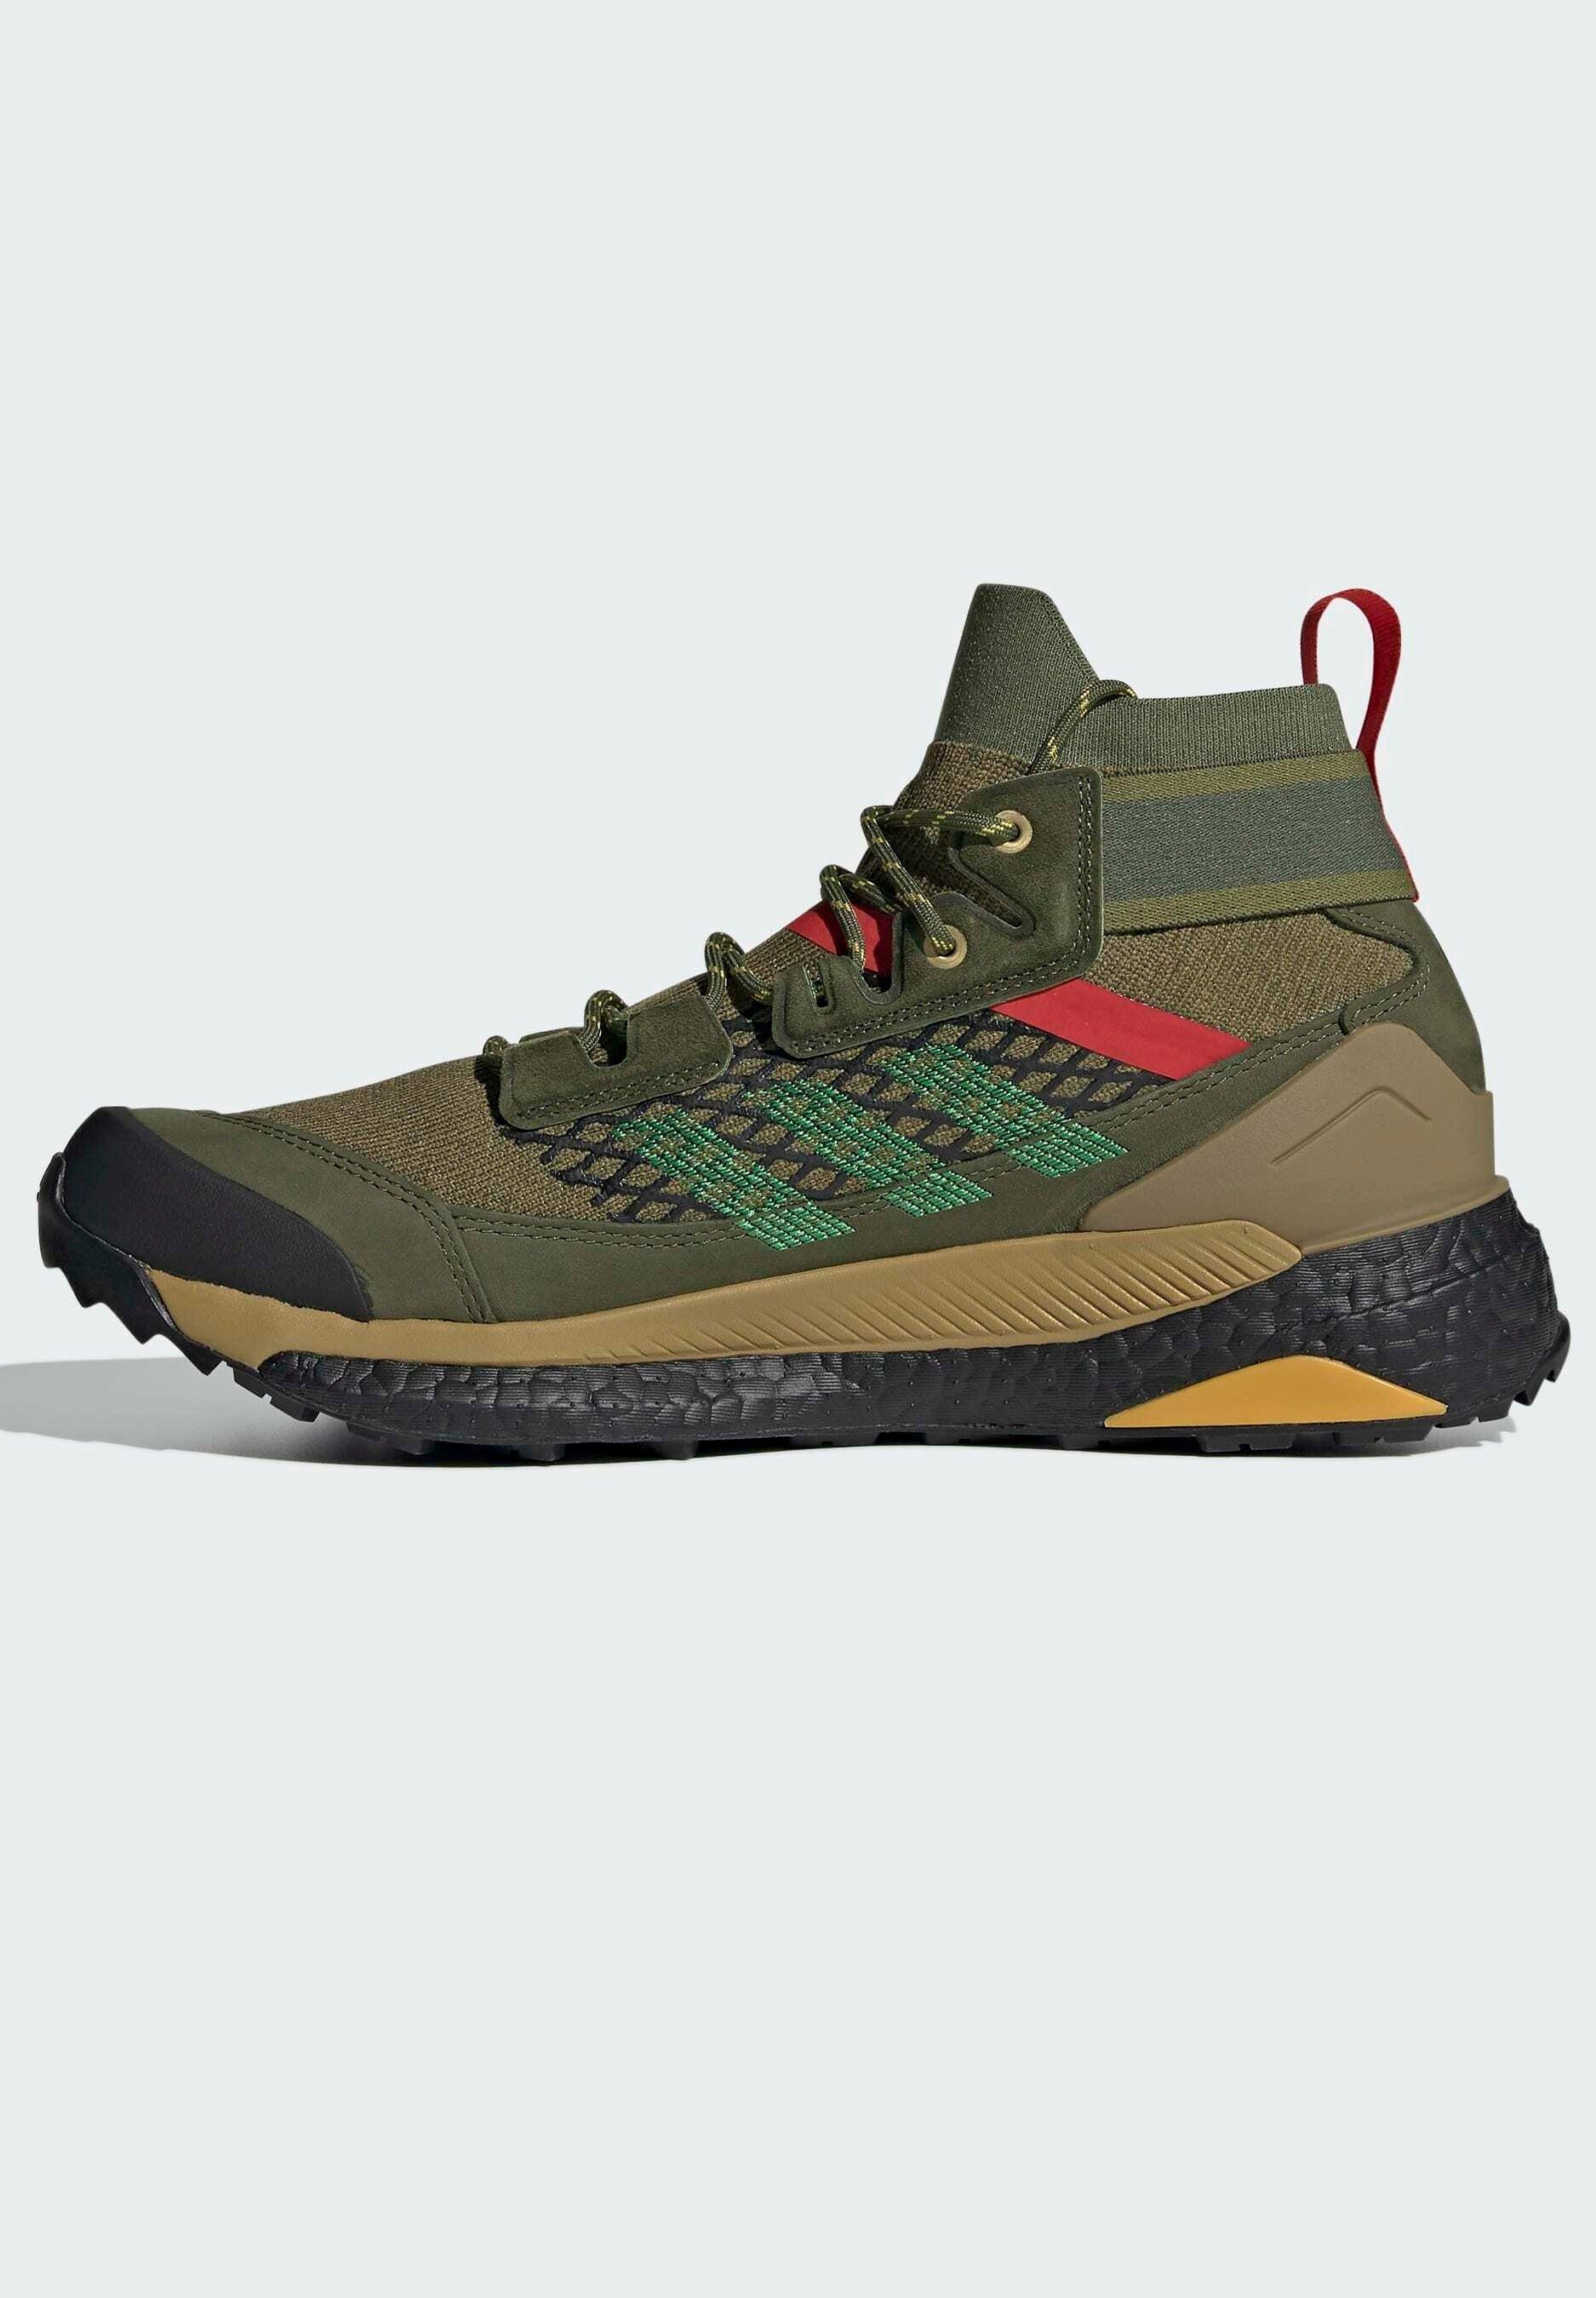 Women FREE HIKER BOOST PRIMEKNIT HIKING SHOES - Hiking shoes